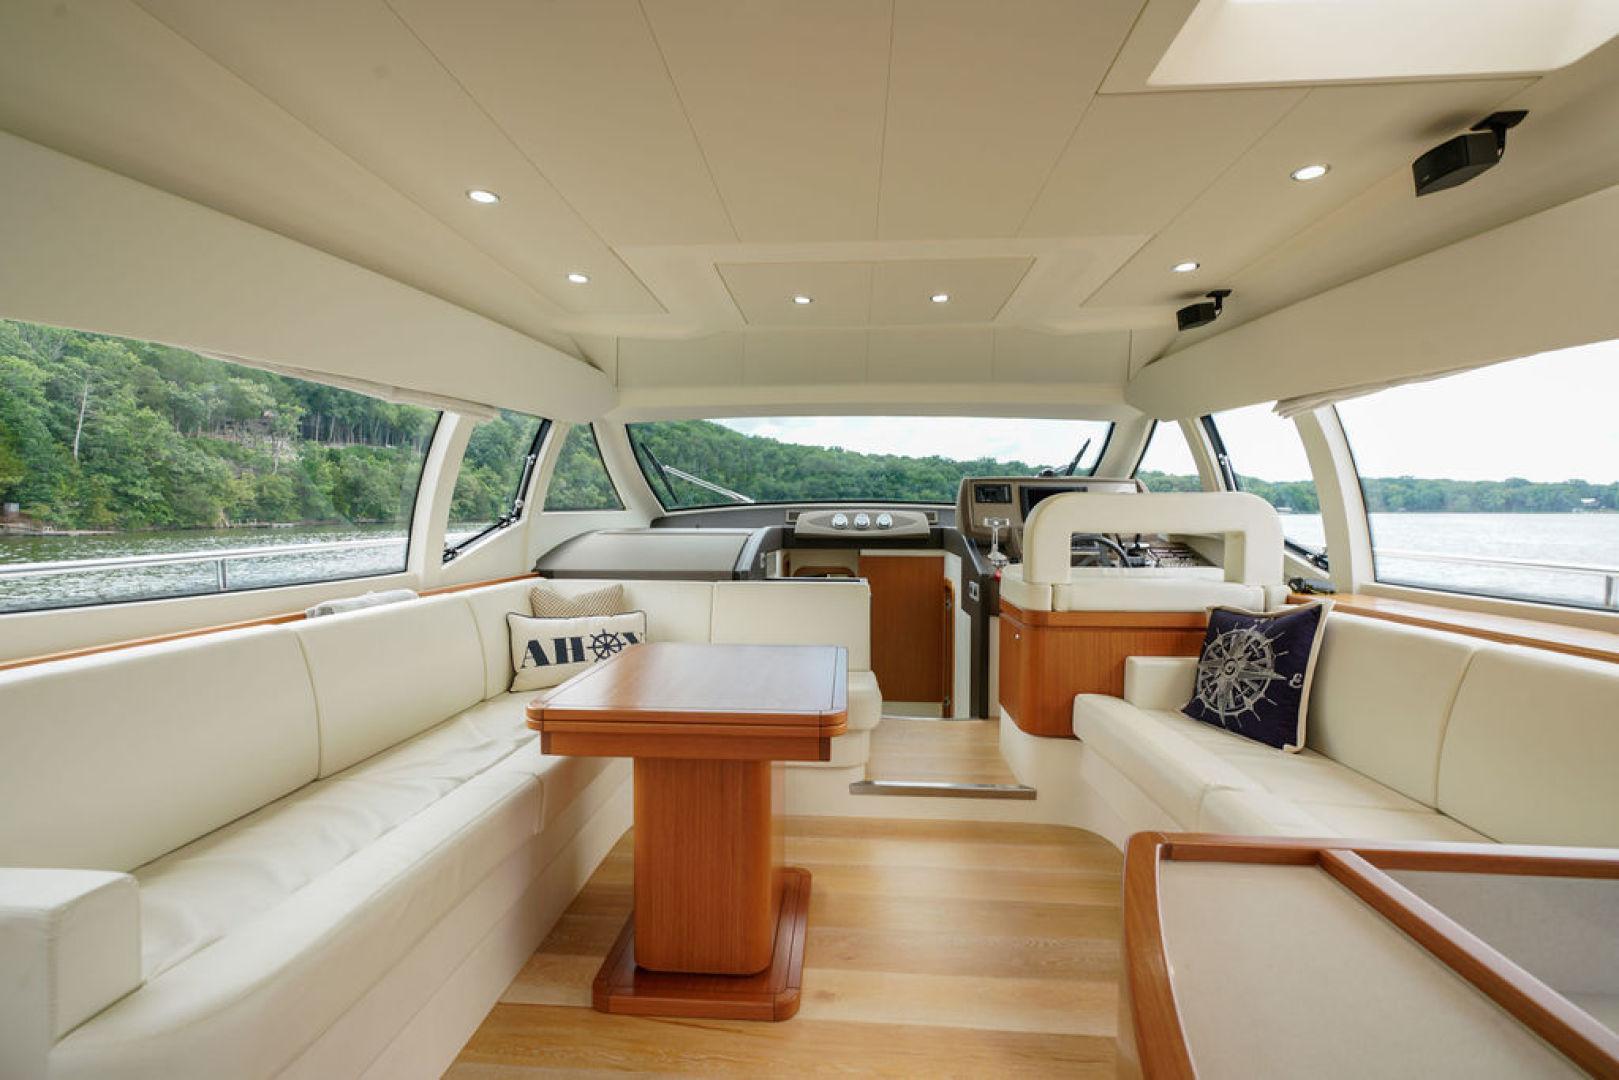 Ferretti Yachts-530 2013-ISLAND GIRL Mount Juliet-Tennessee-United States-1574694   Thumbnail